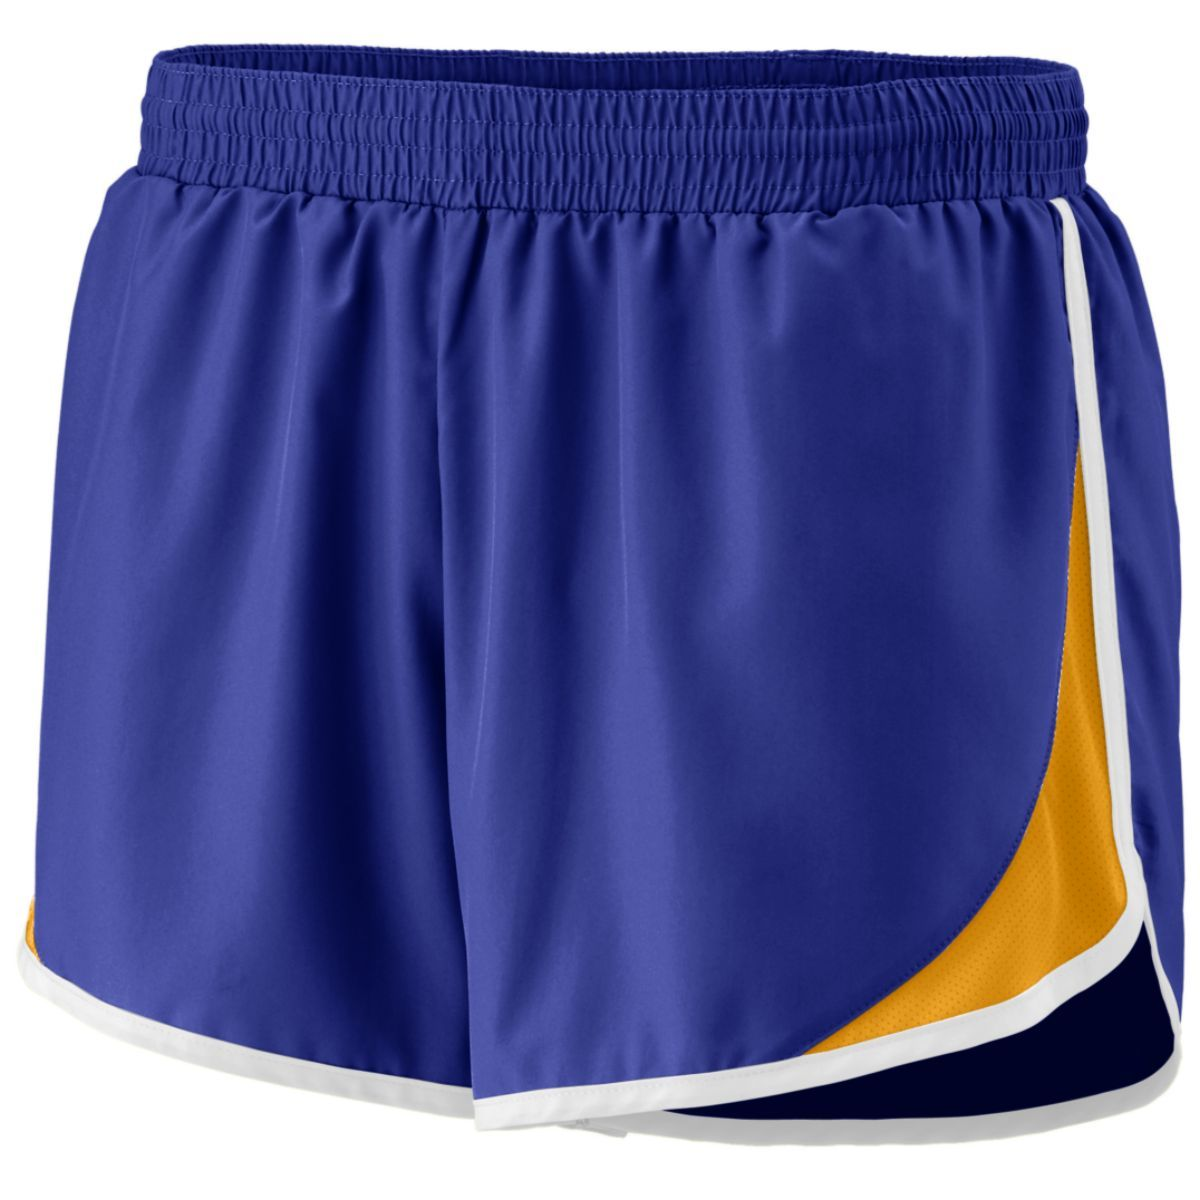 Ladies Adrenaline Shorts - PURPLE/GOLD/WHITE